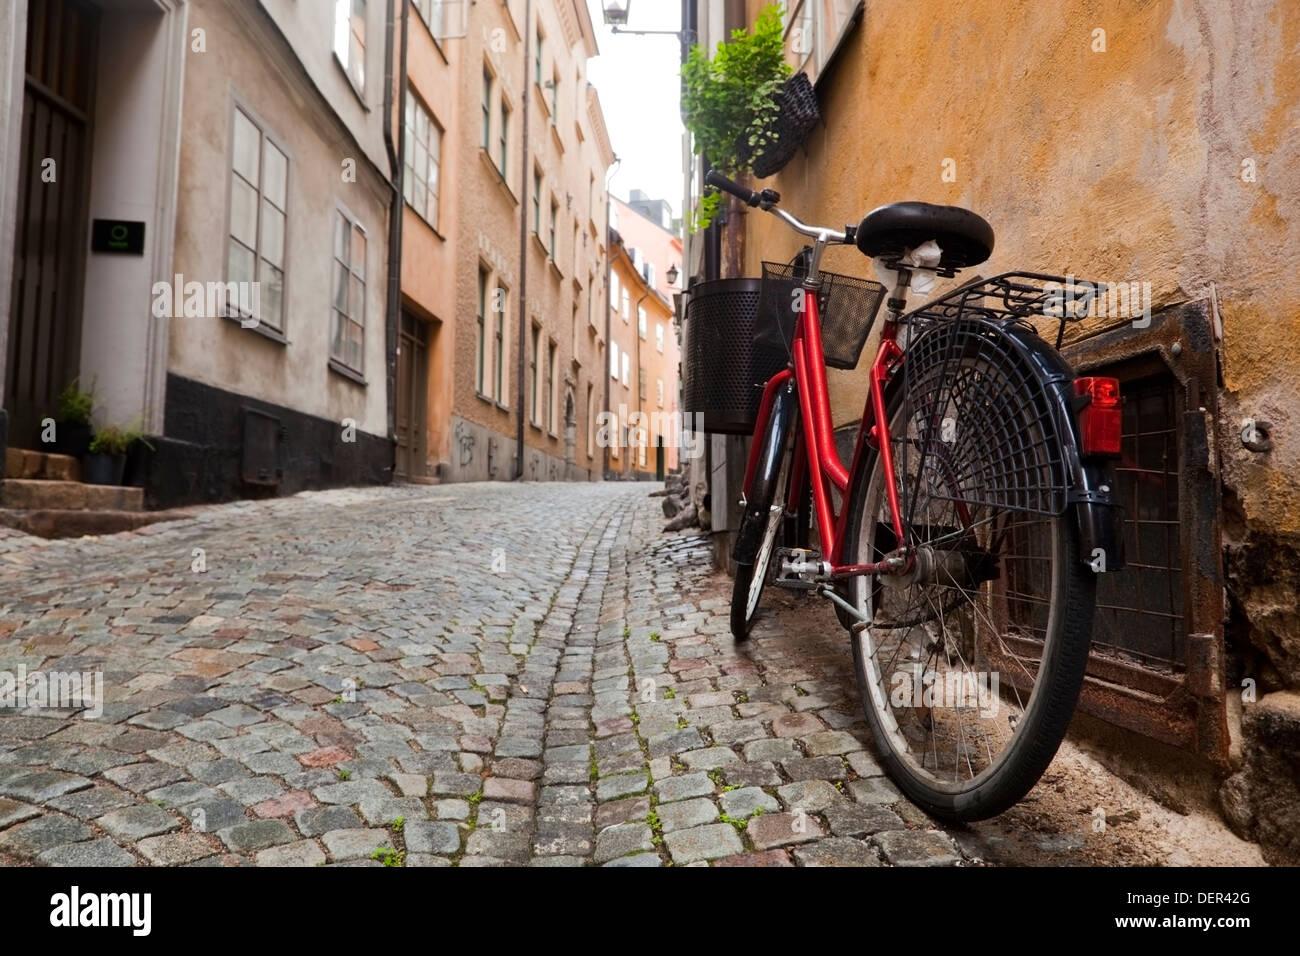 Una bici in hotel di Gamla Stan città vecchia di Stoccolma, Svezia, Europa Immagini Stock